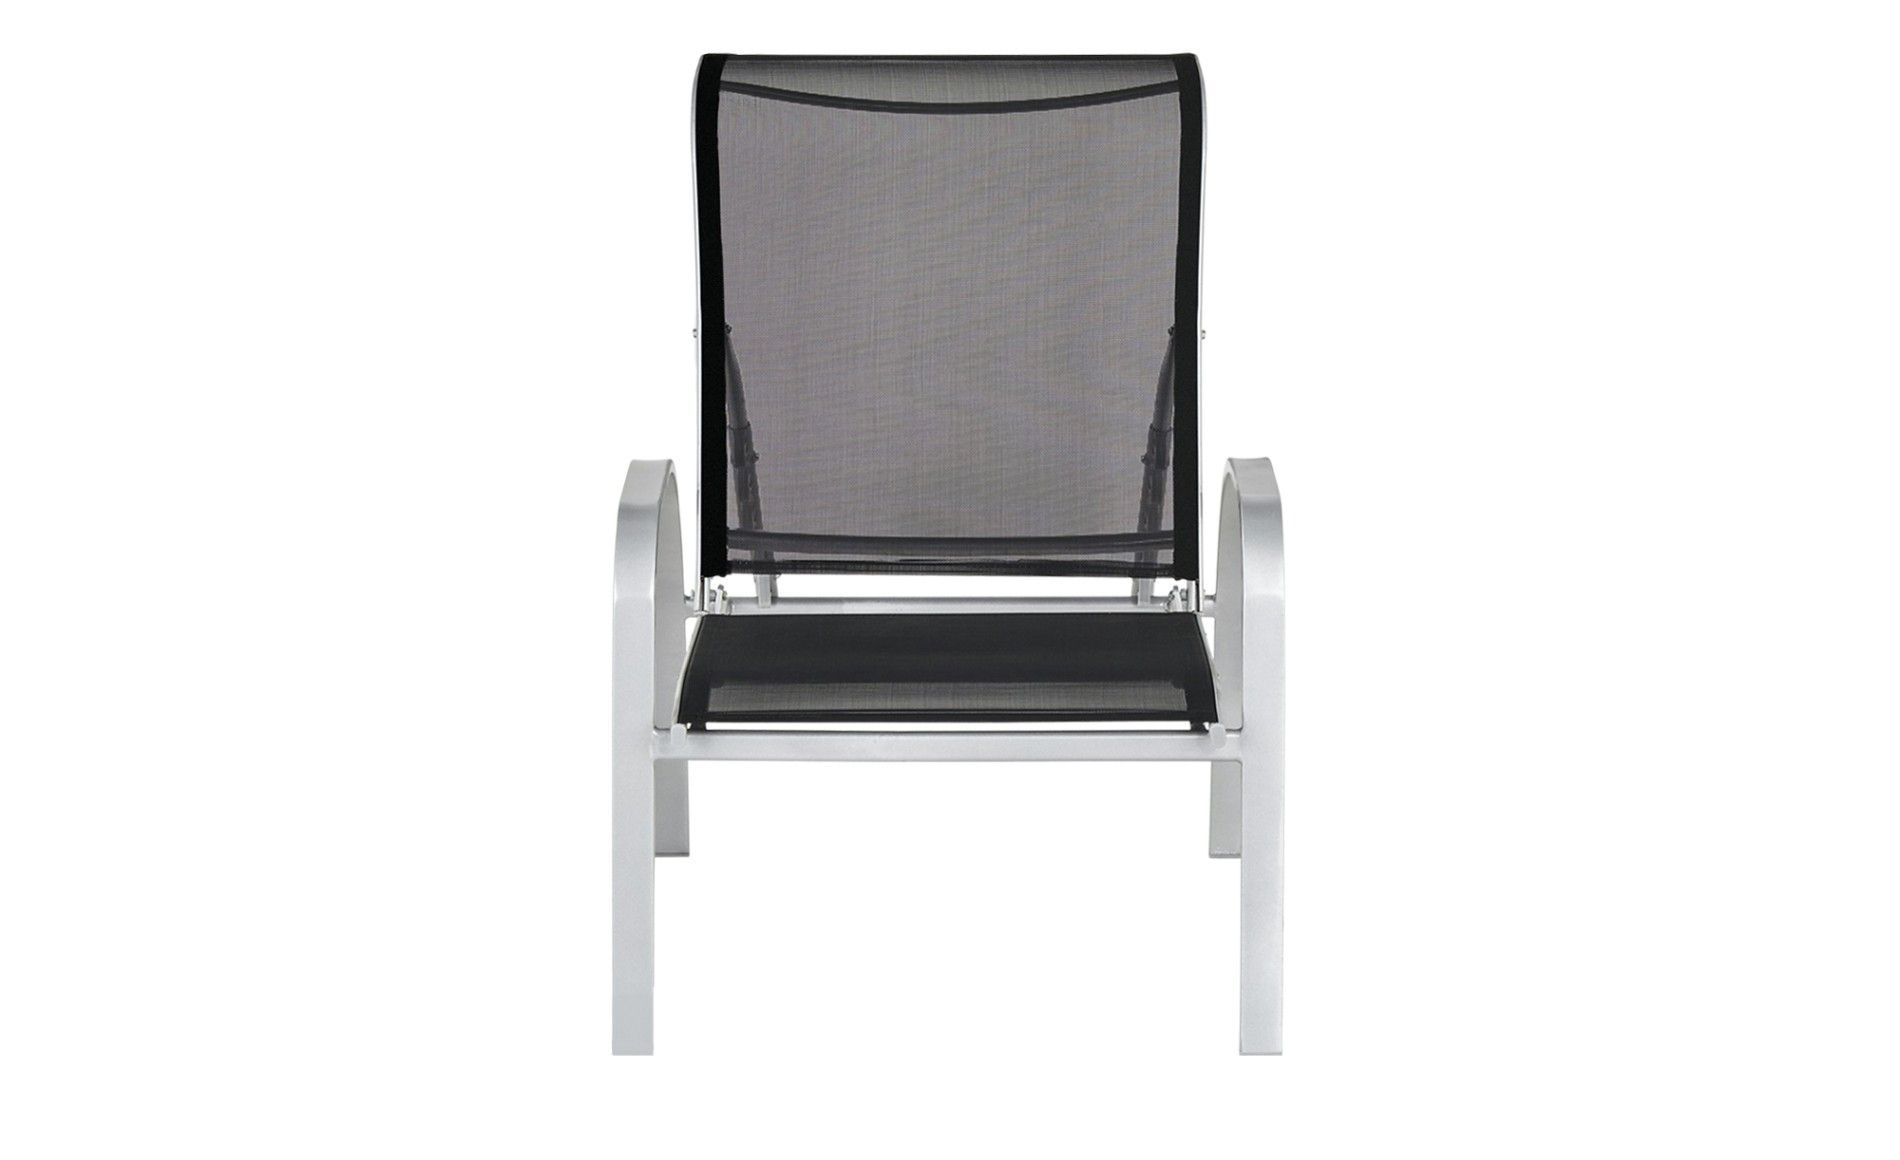 Peaceful Zweier Sessel Decor Home Decor Outdoor Chairs